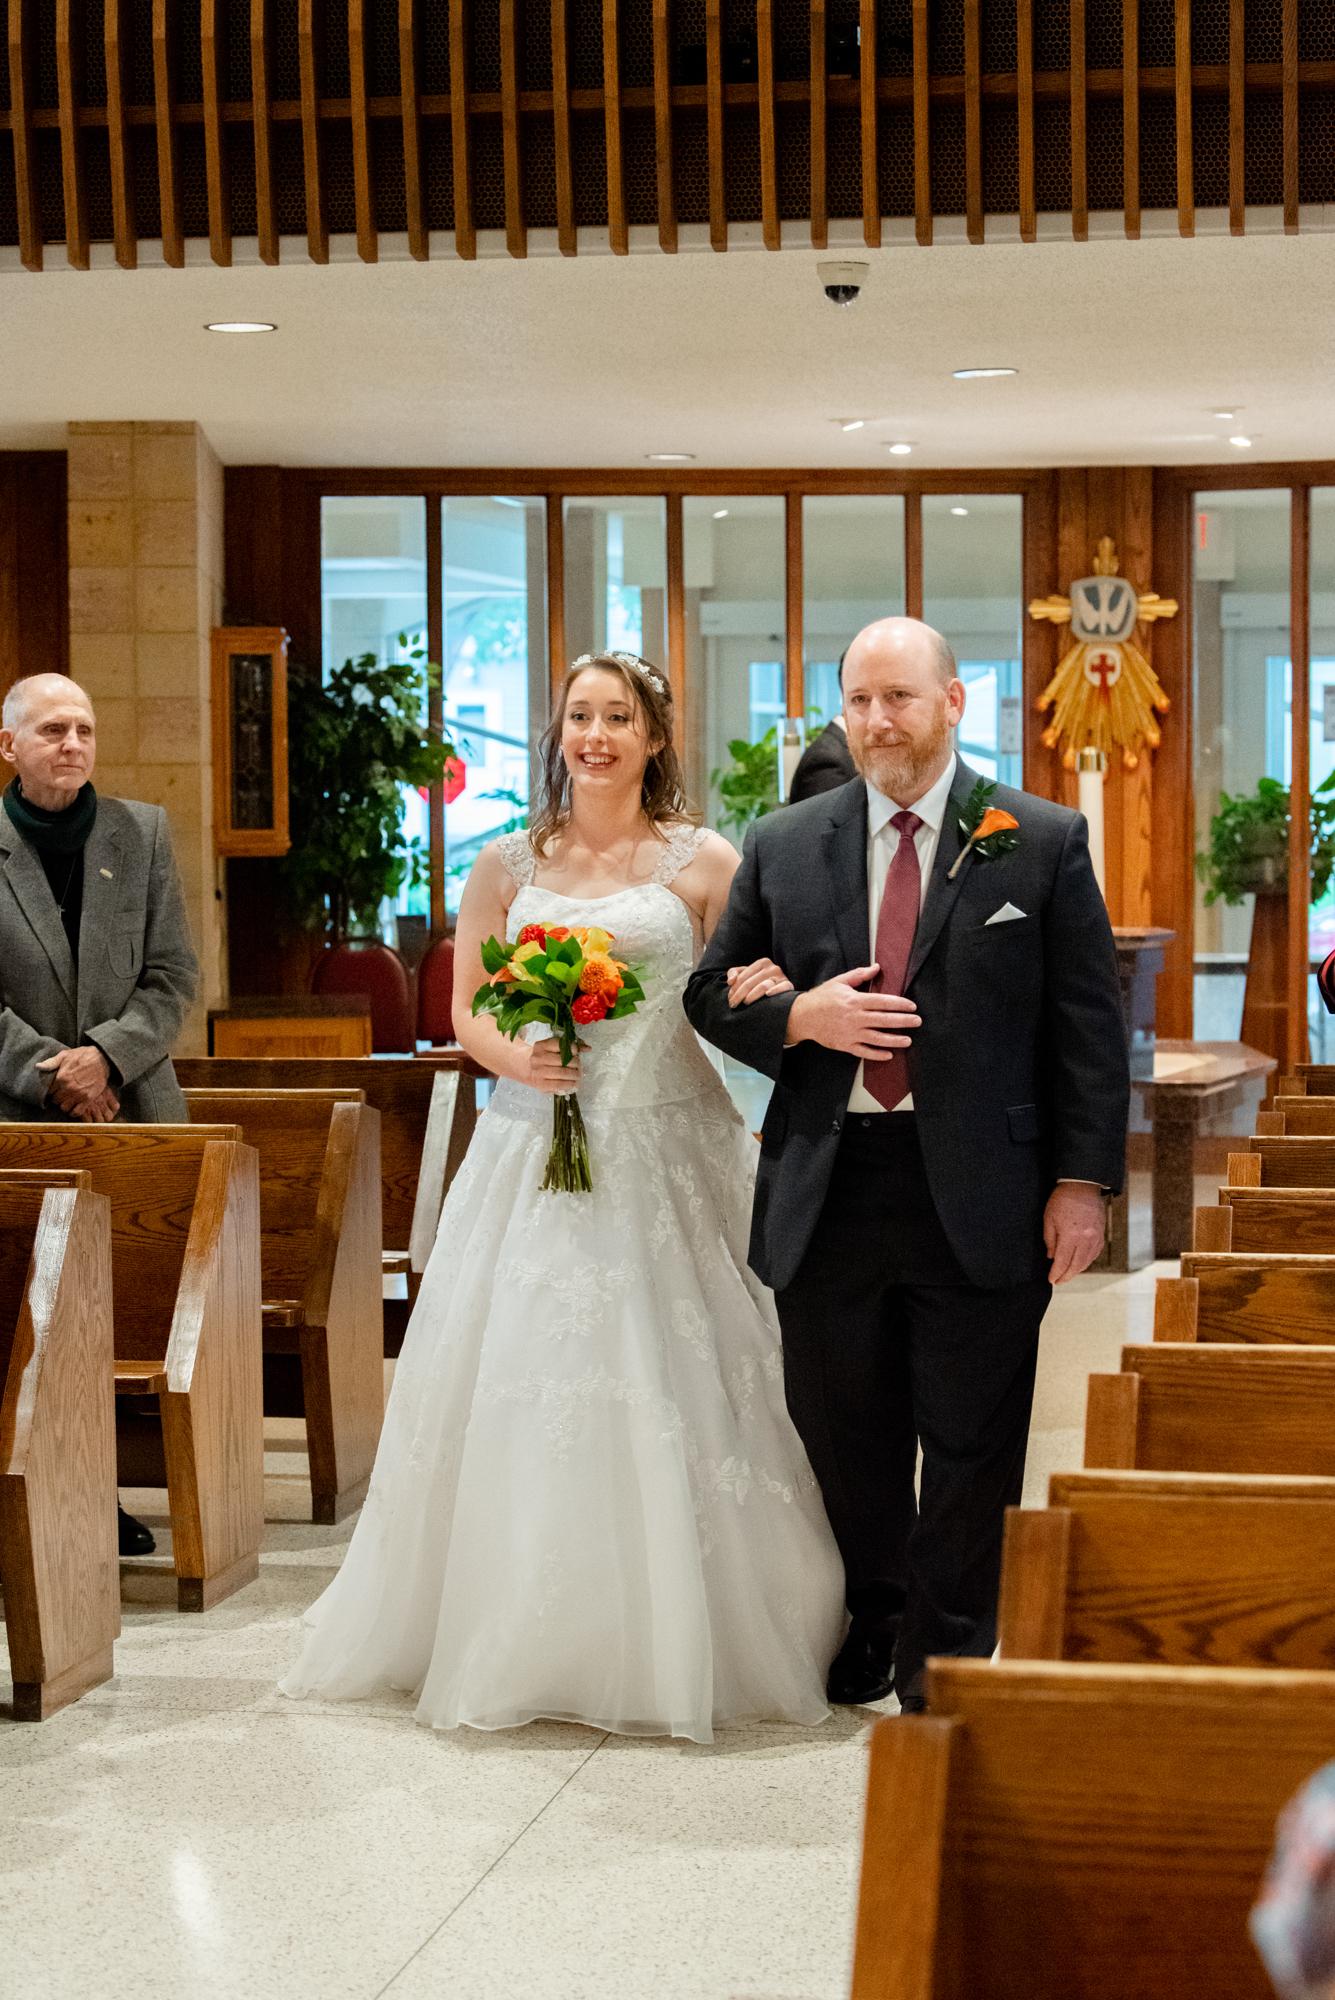 DSC 8005 - Emma and Chris | Fargo Wedding